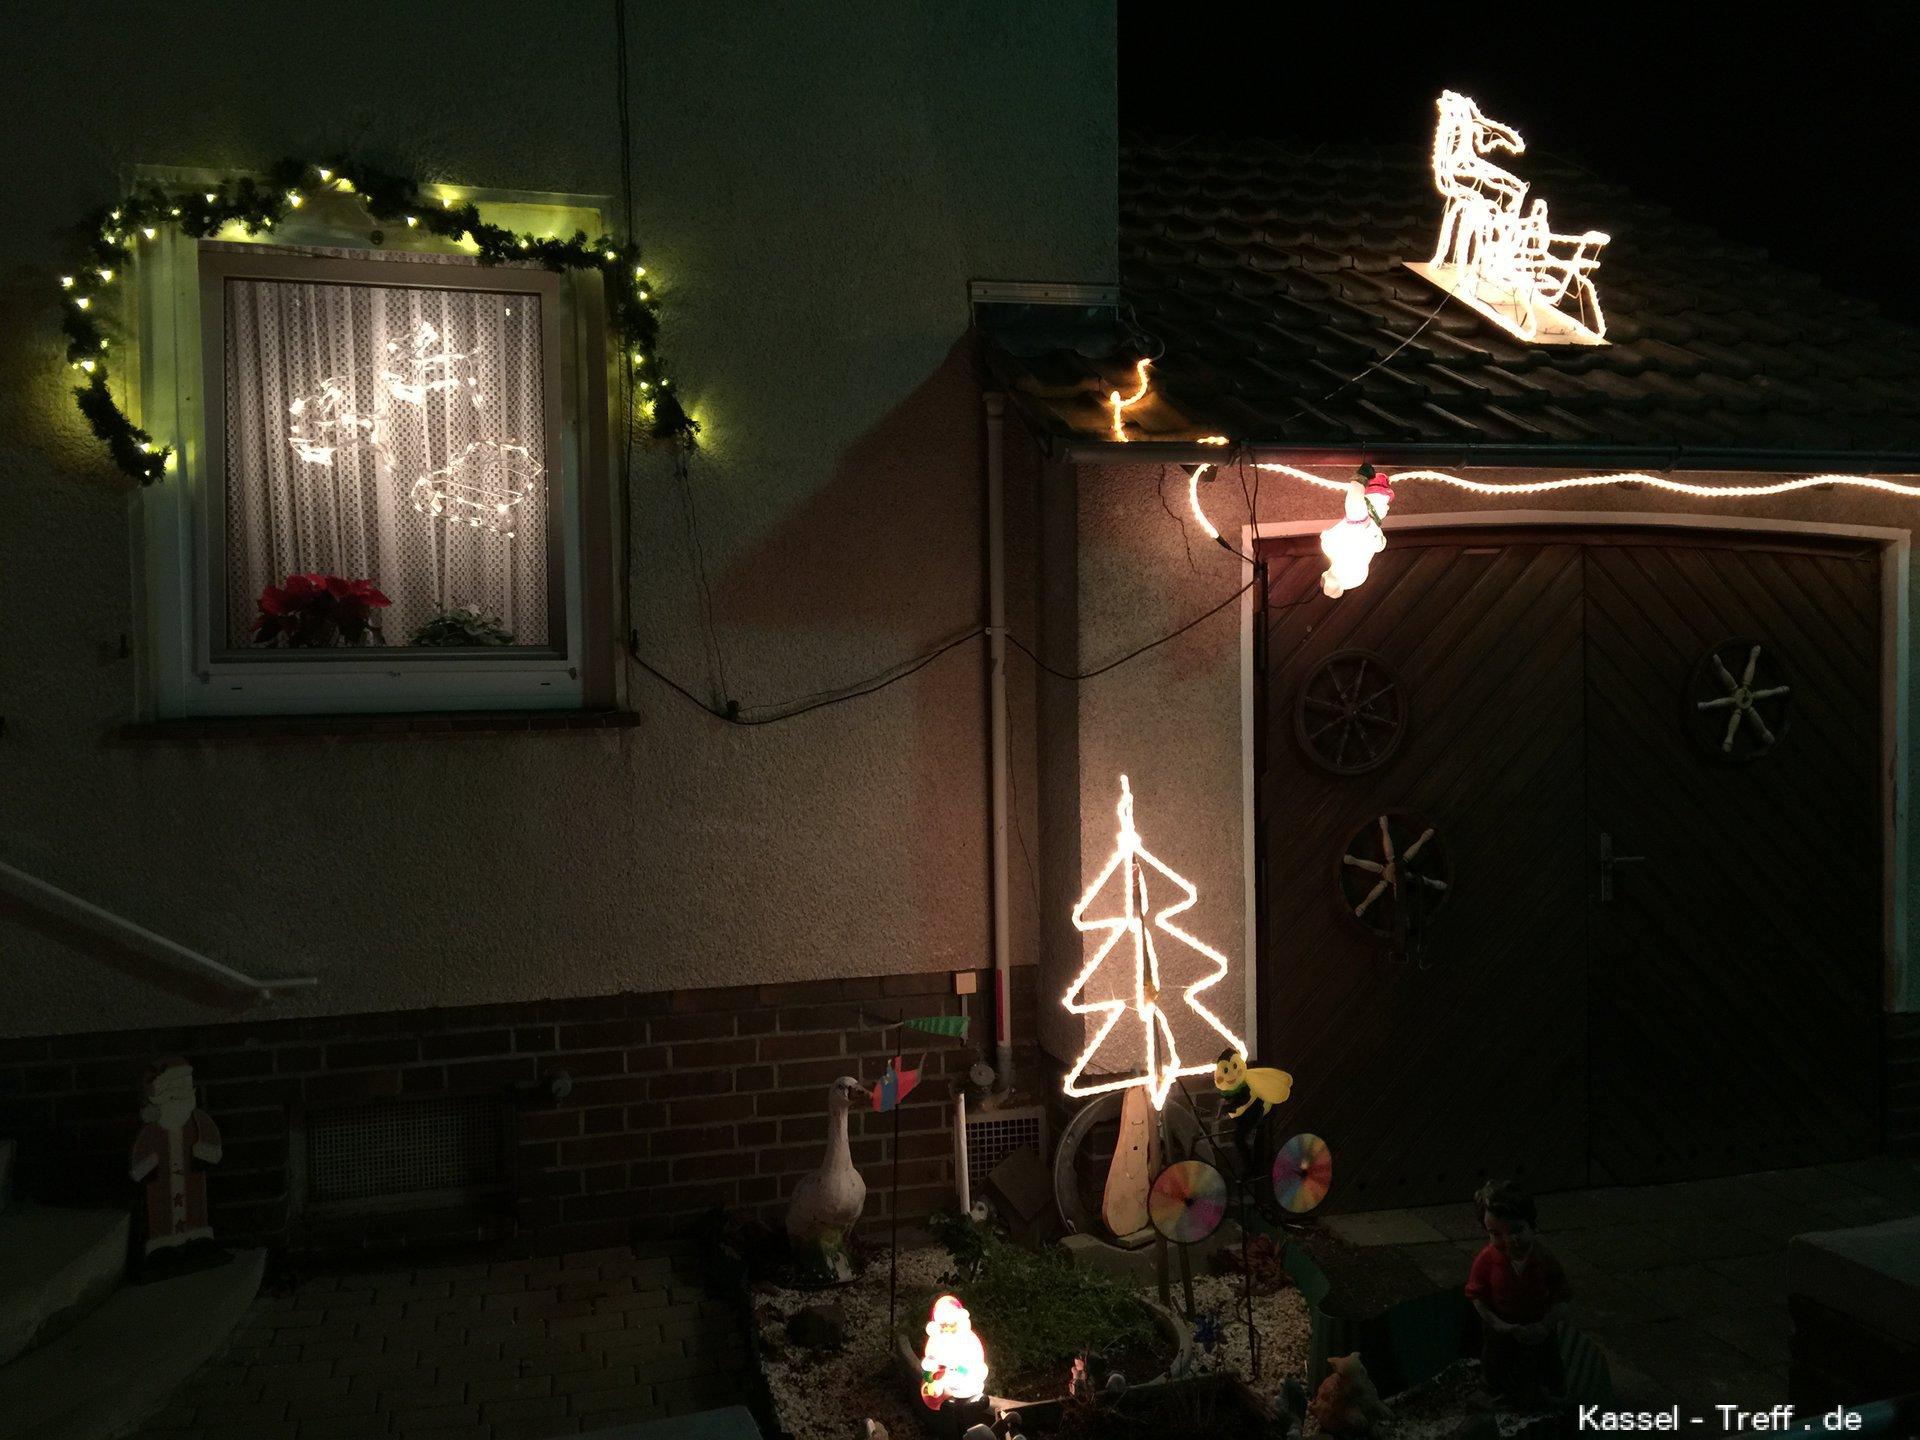 Weihnachtsbeleuchtung Forum.Weihnachtsbeleuchtung Am Haus Kassel Nordhessen Forum